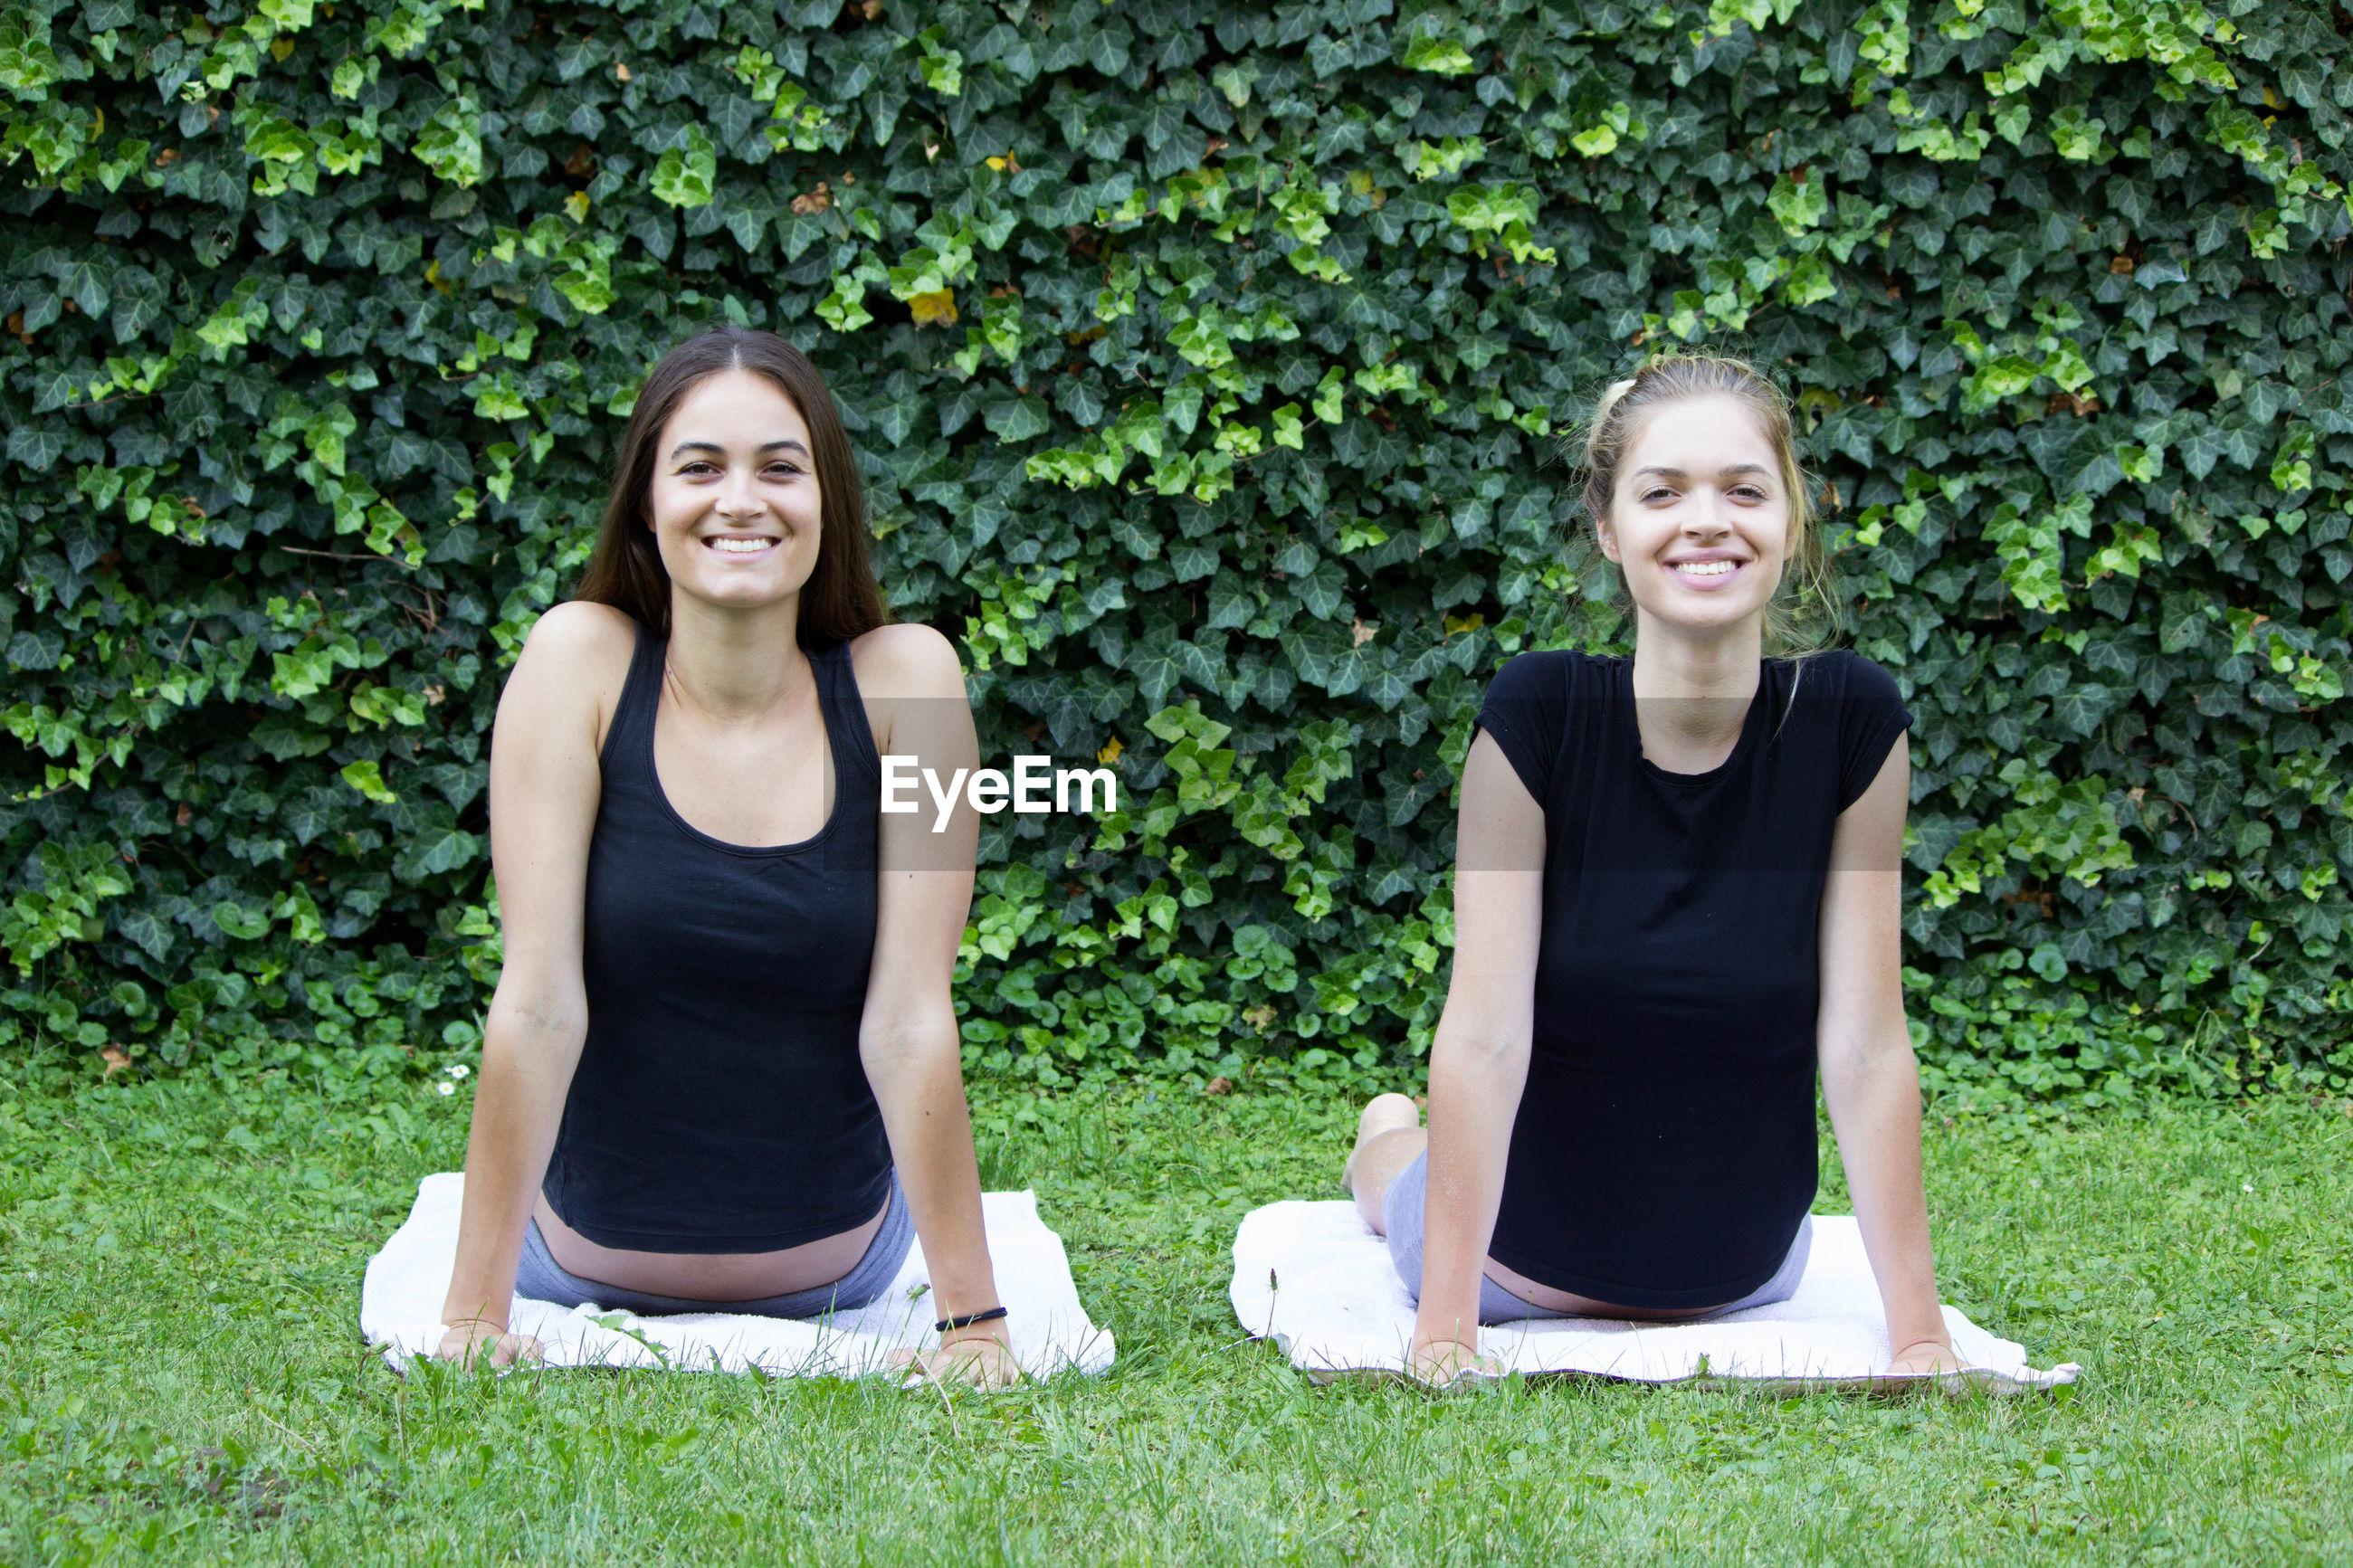 Portrait of smiling friends exercising against plants in park